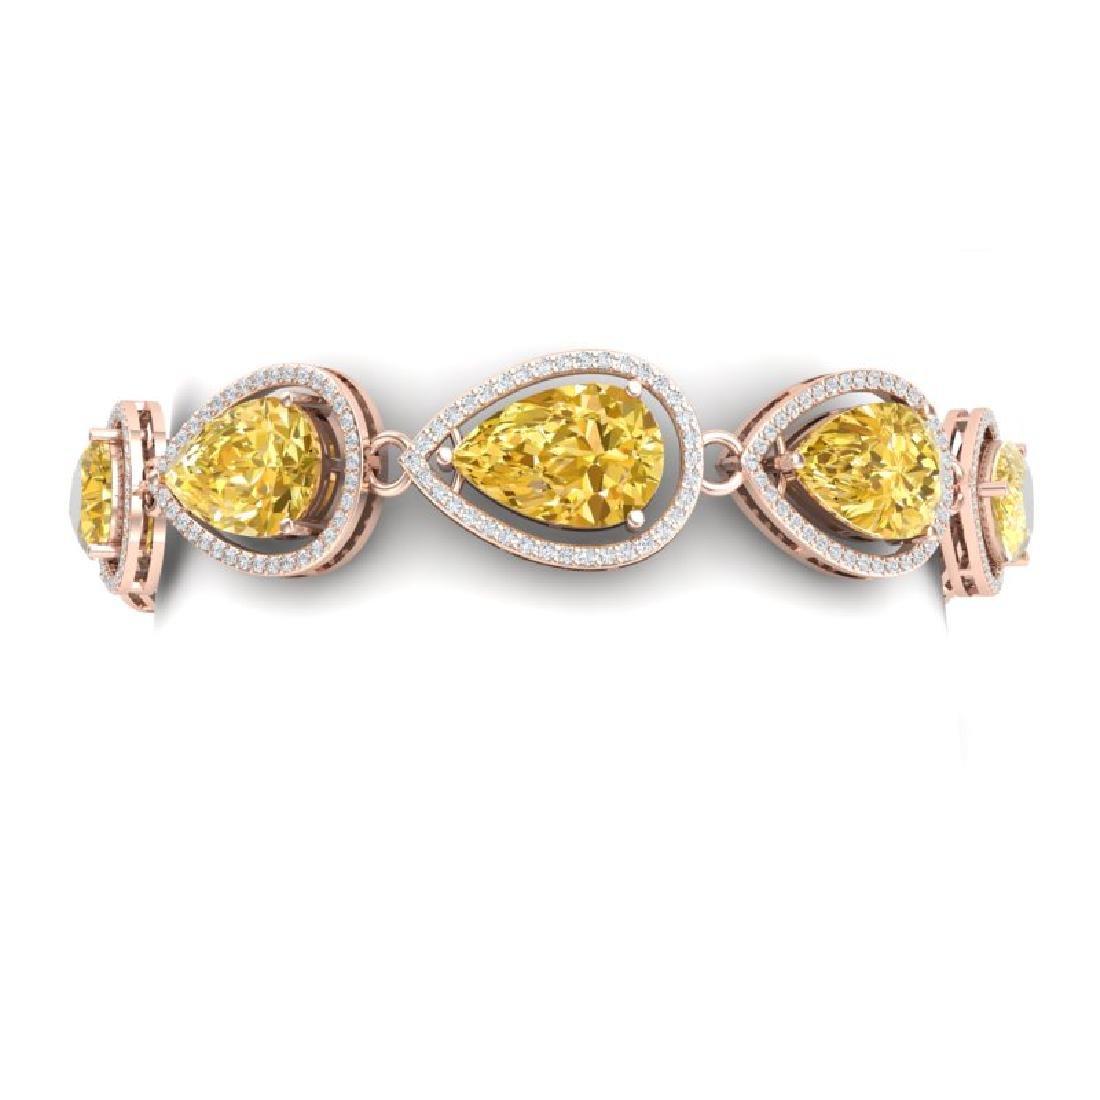 21.47 CTW Royalty Canary Citrine & VS Diamond Bracelet